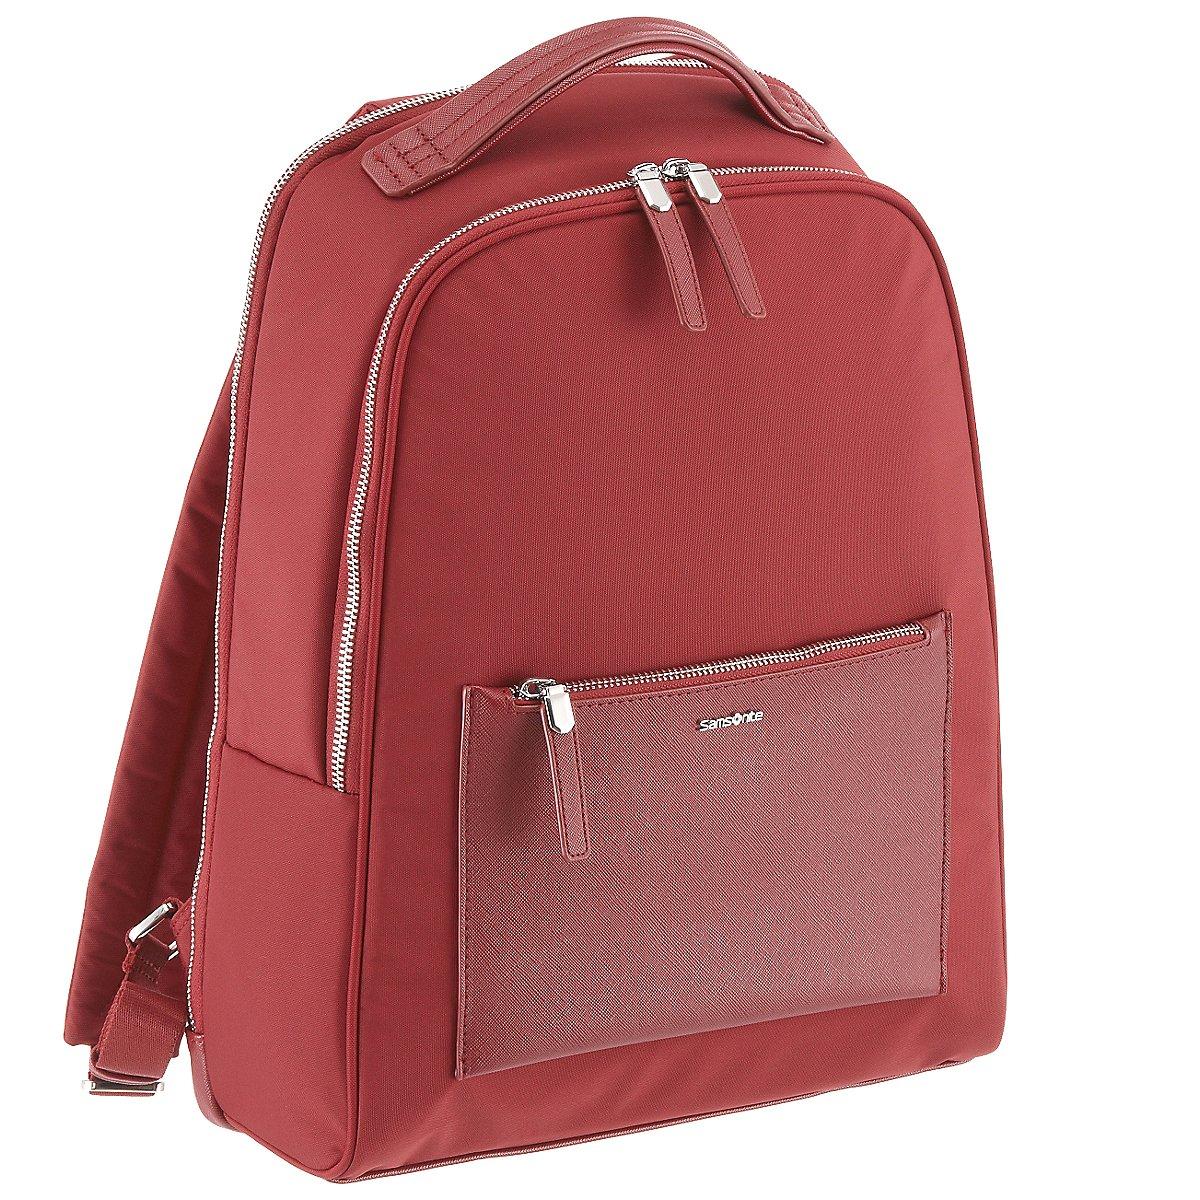 samsonite zalia rucksack mit laptopfach 44 cm koffer. Black Bedroom Furniture Sets. Home Design Ideas